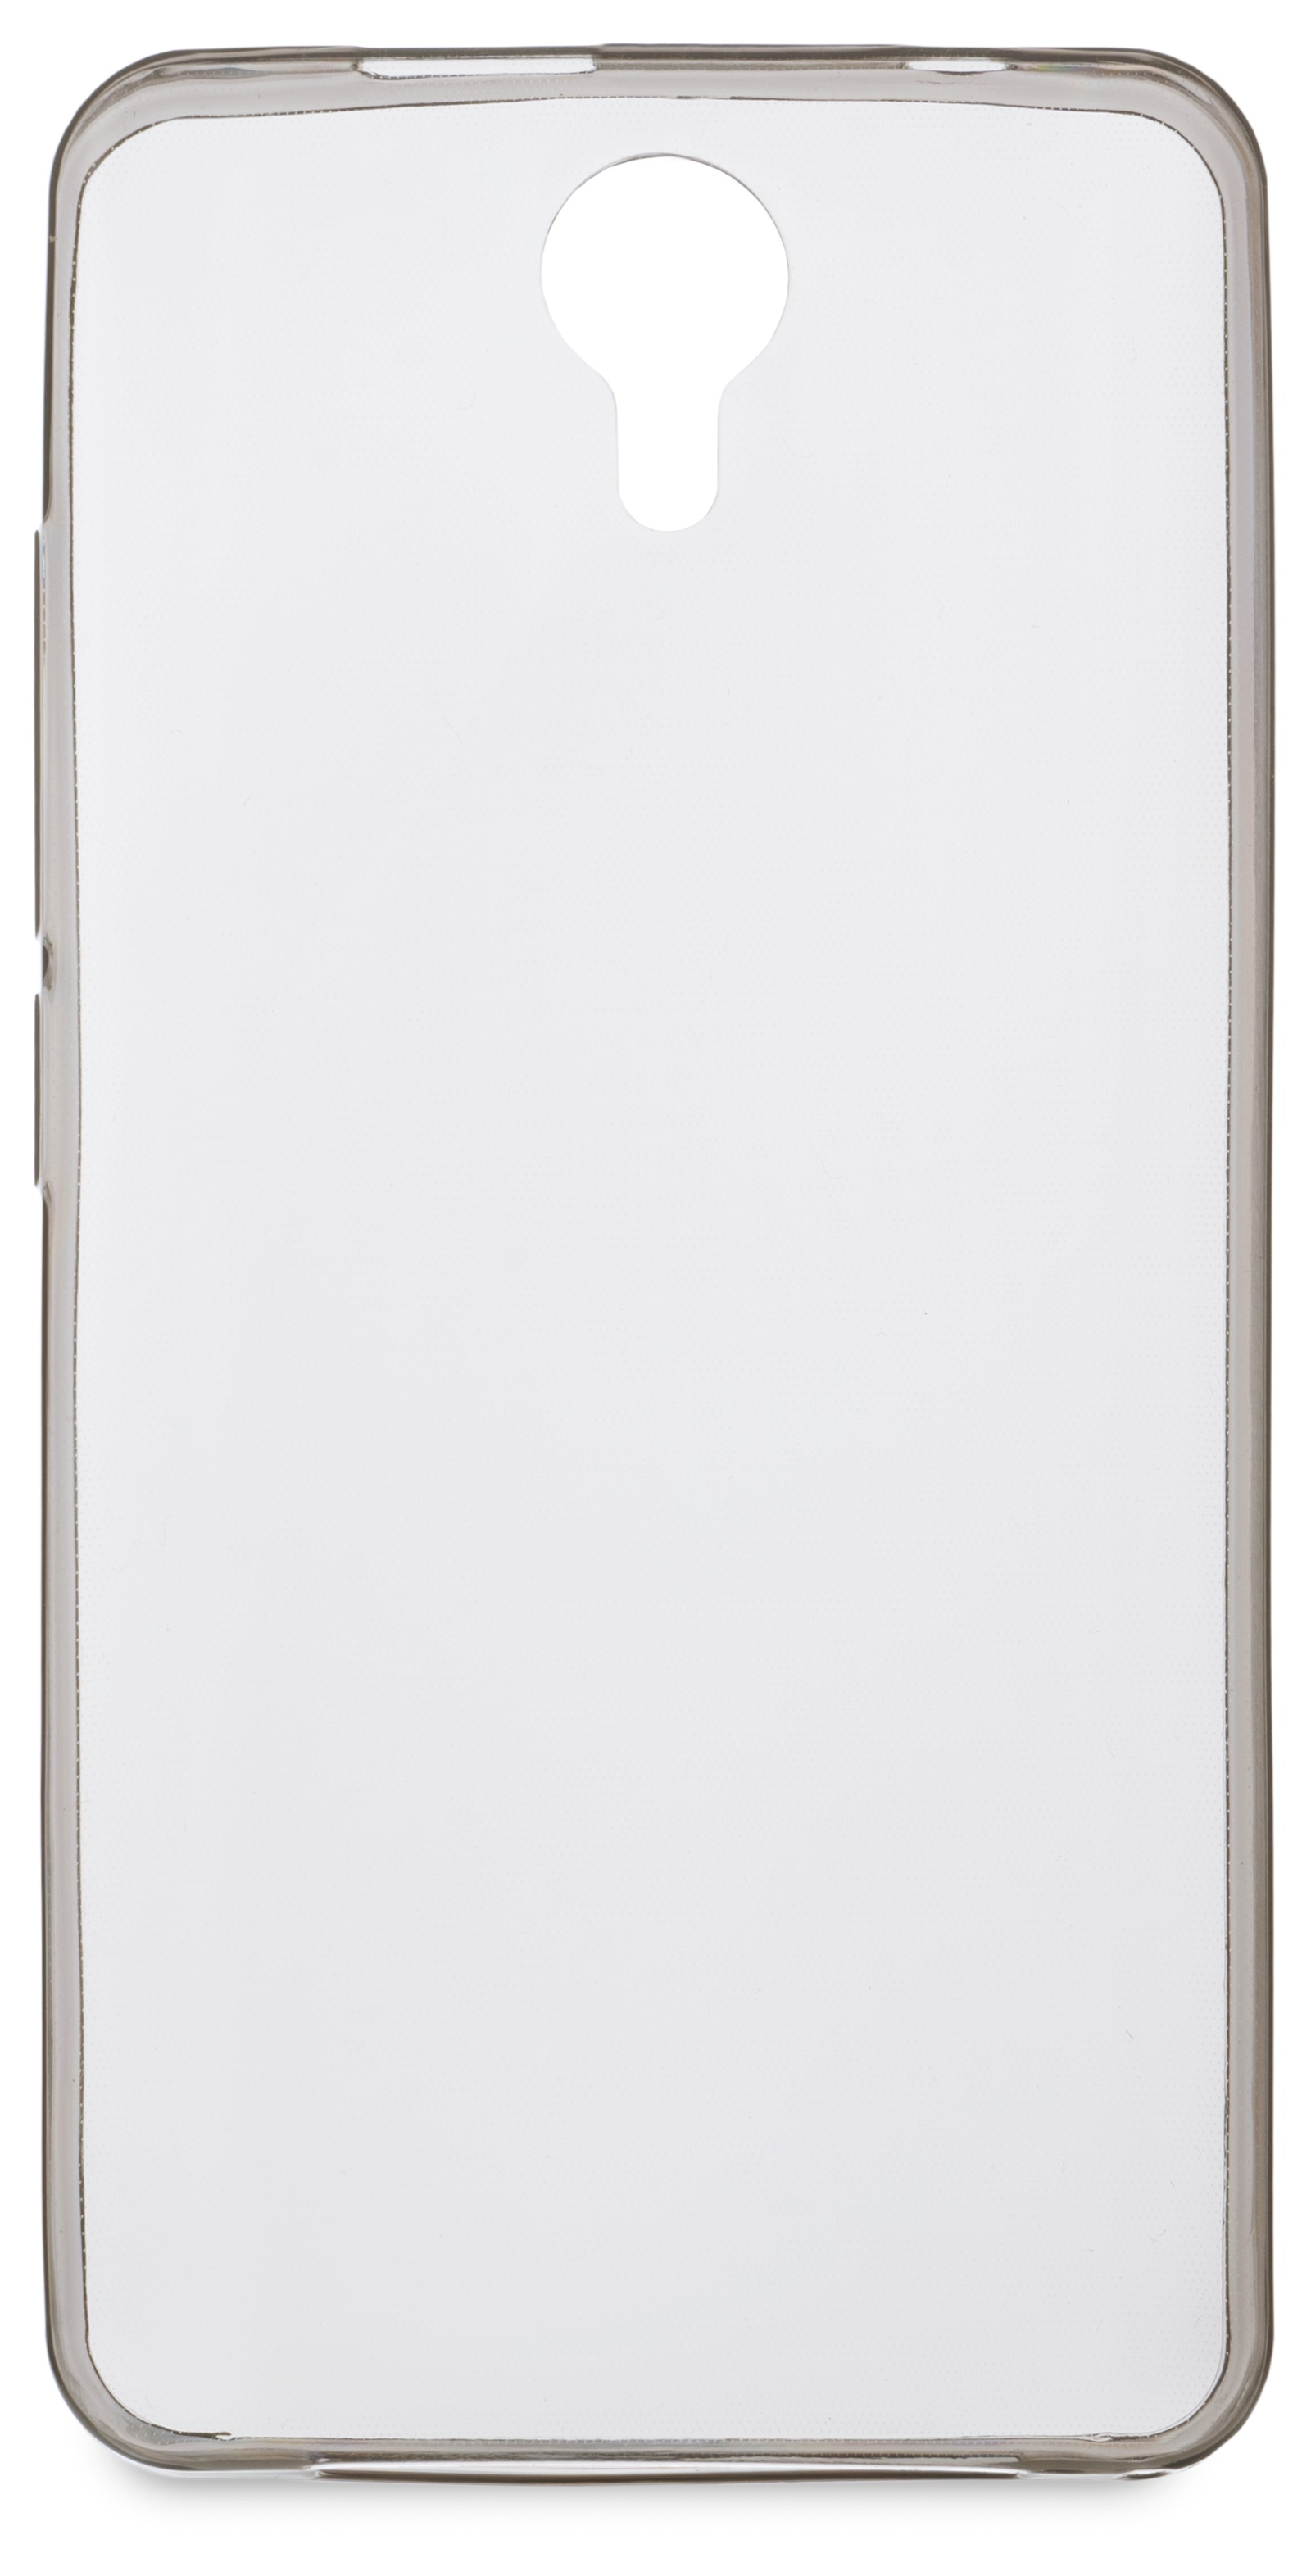 Чехол для сотового телефона skinBOX Slim Silicone, 4660041405224, прозрачный цена и фото